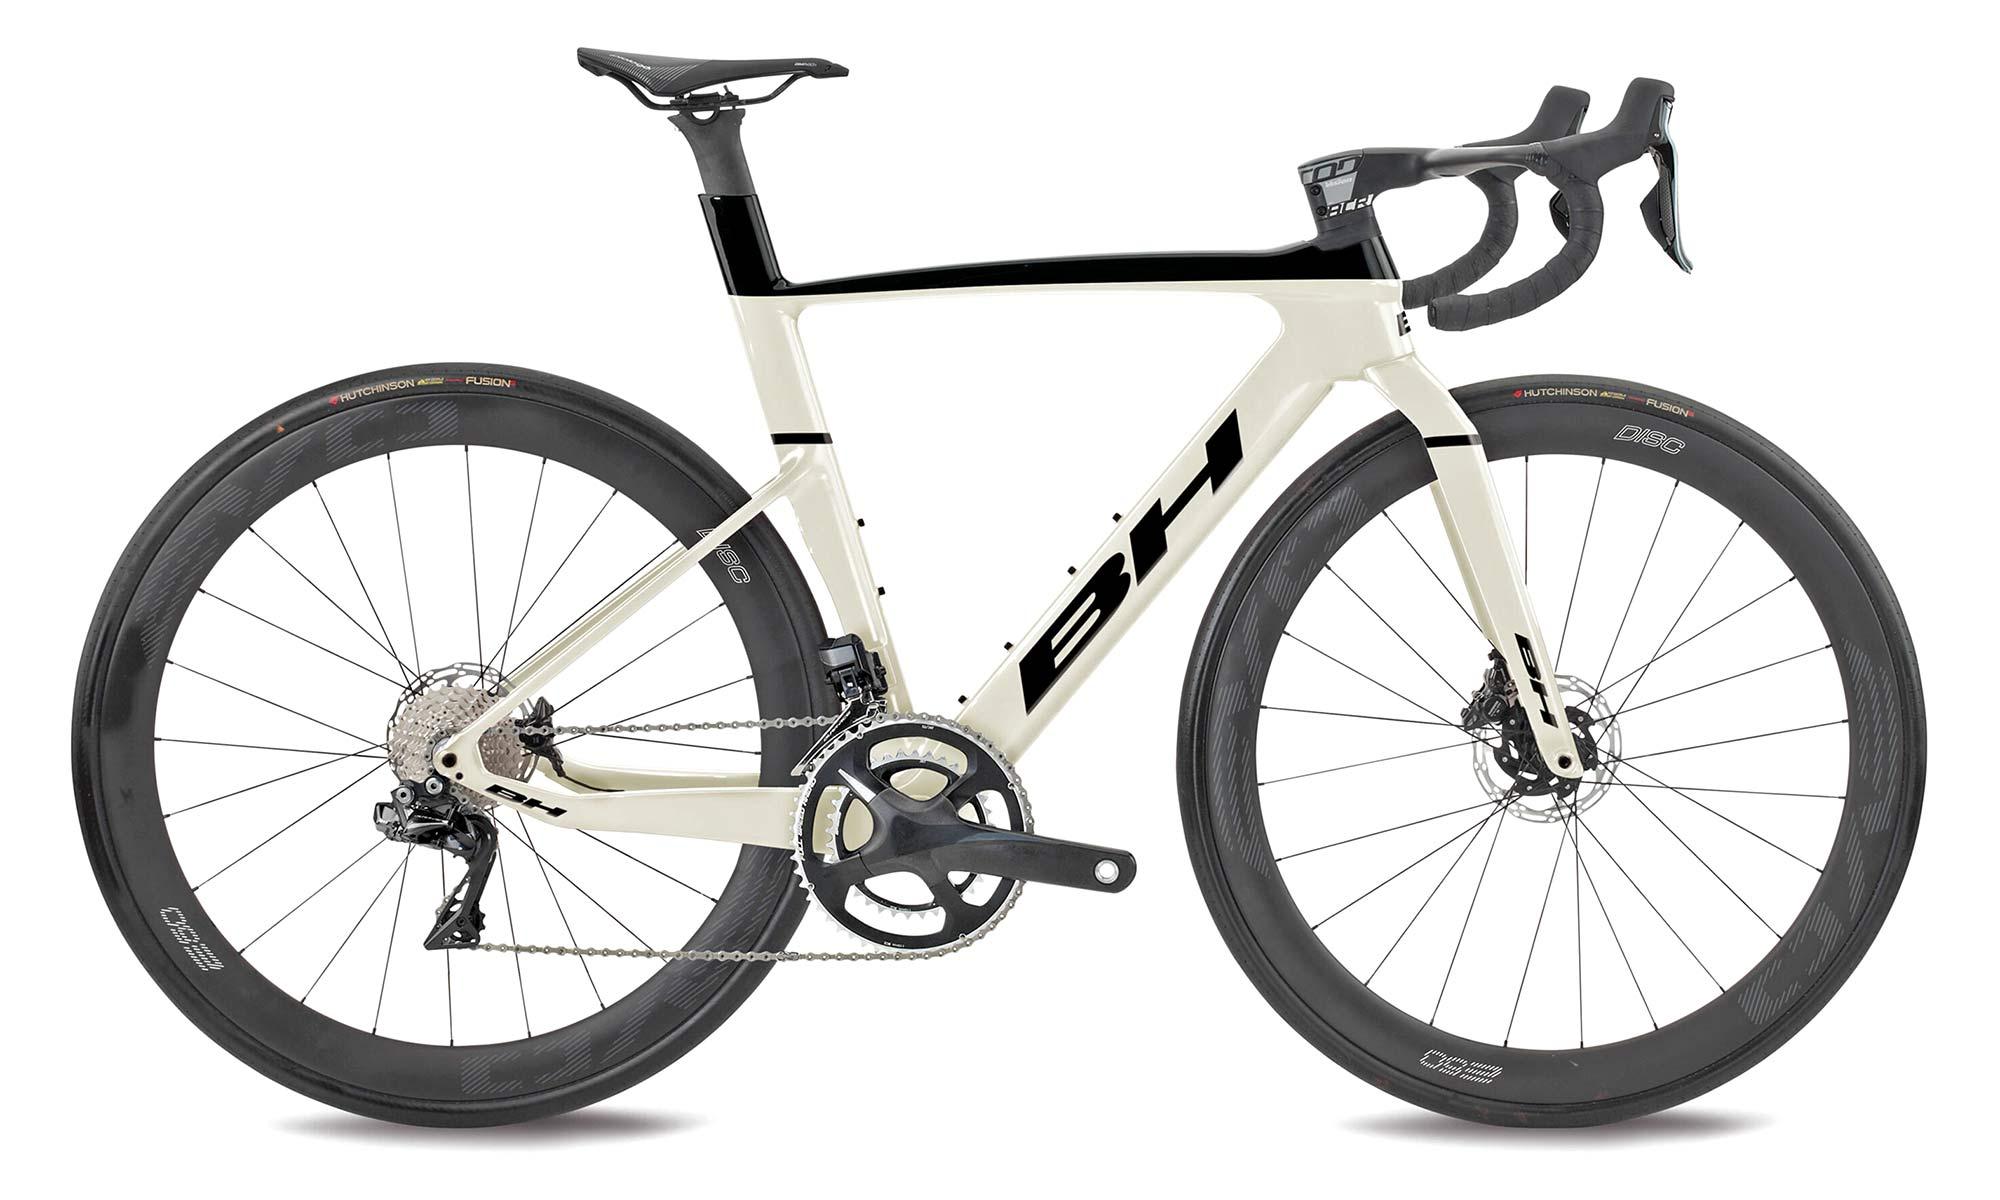 2022 BH Aerolight lightweight aero carbon all-rounder road bike,7 complete